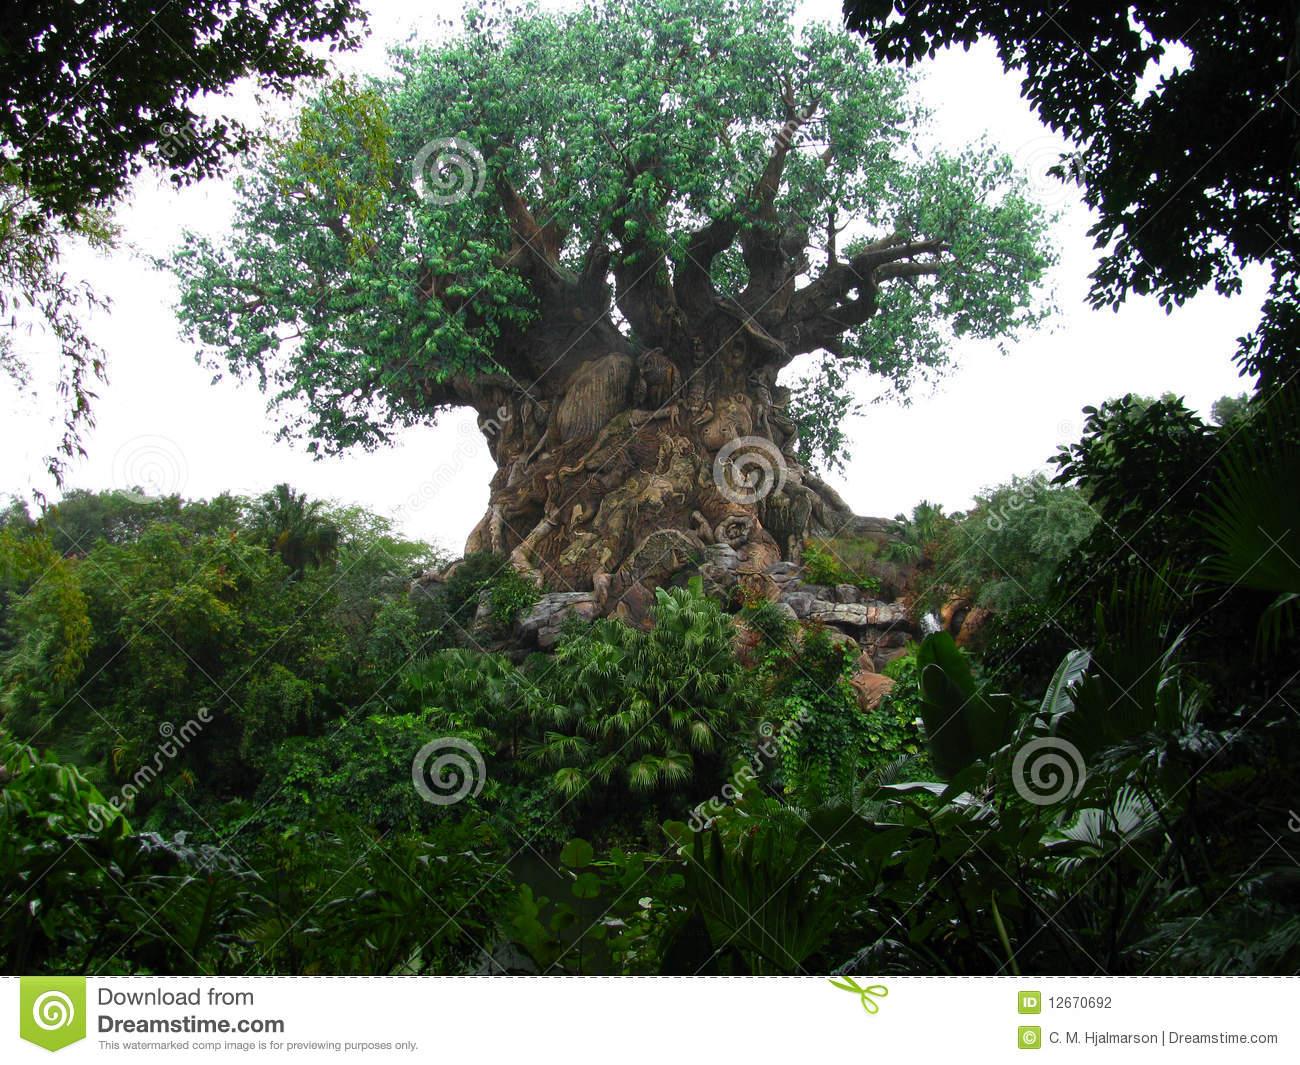 Animal kingdom tree clipart image stock Animal kingdom tree clipart - ClipartFest image stock